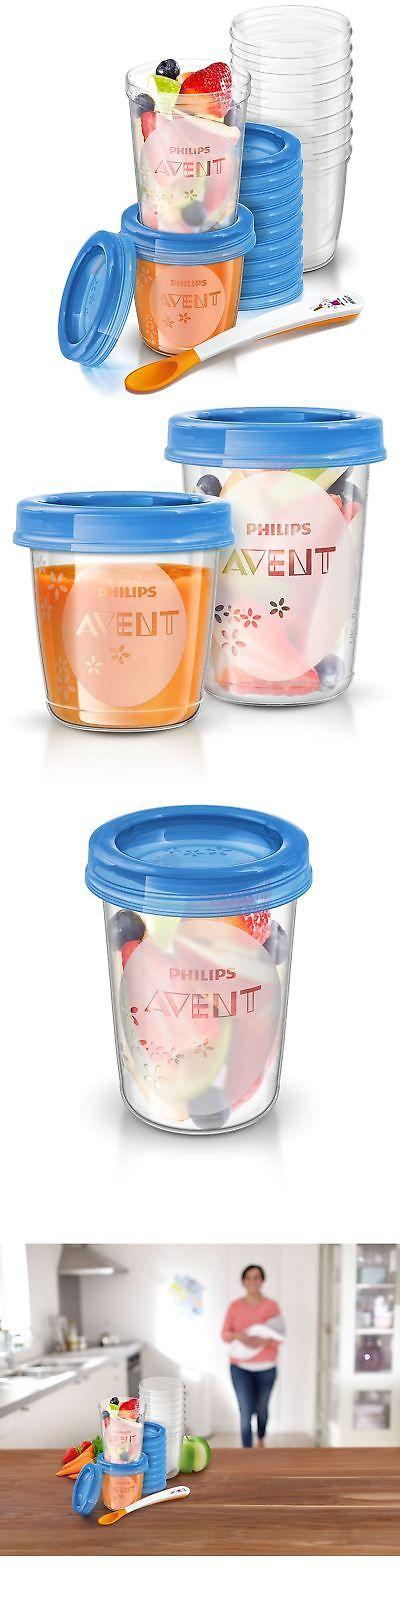 Breast Milk Storage 168751 Philips Avent Baby Food Storage Cups 180